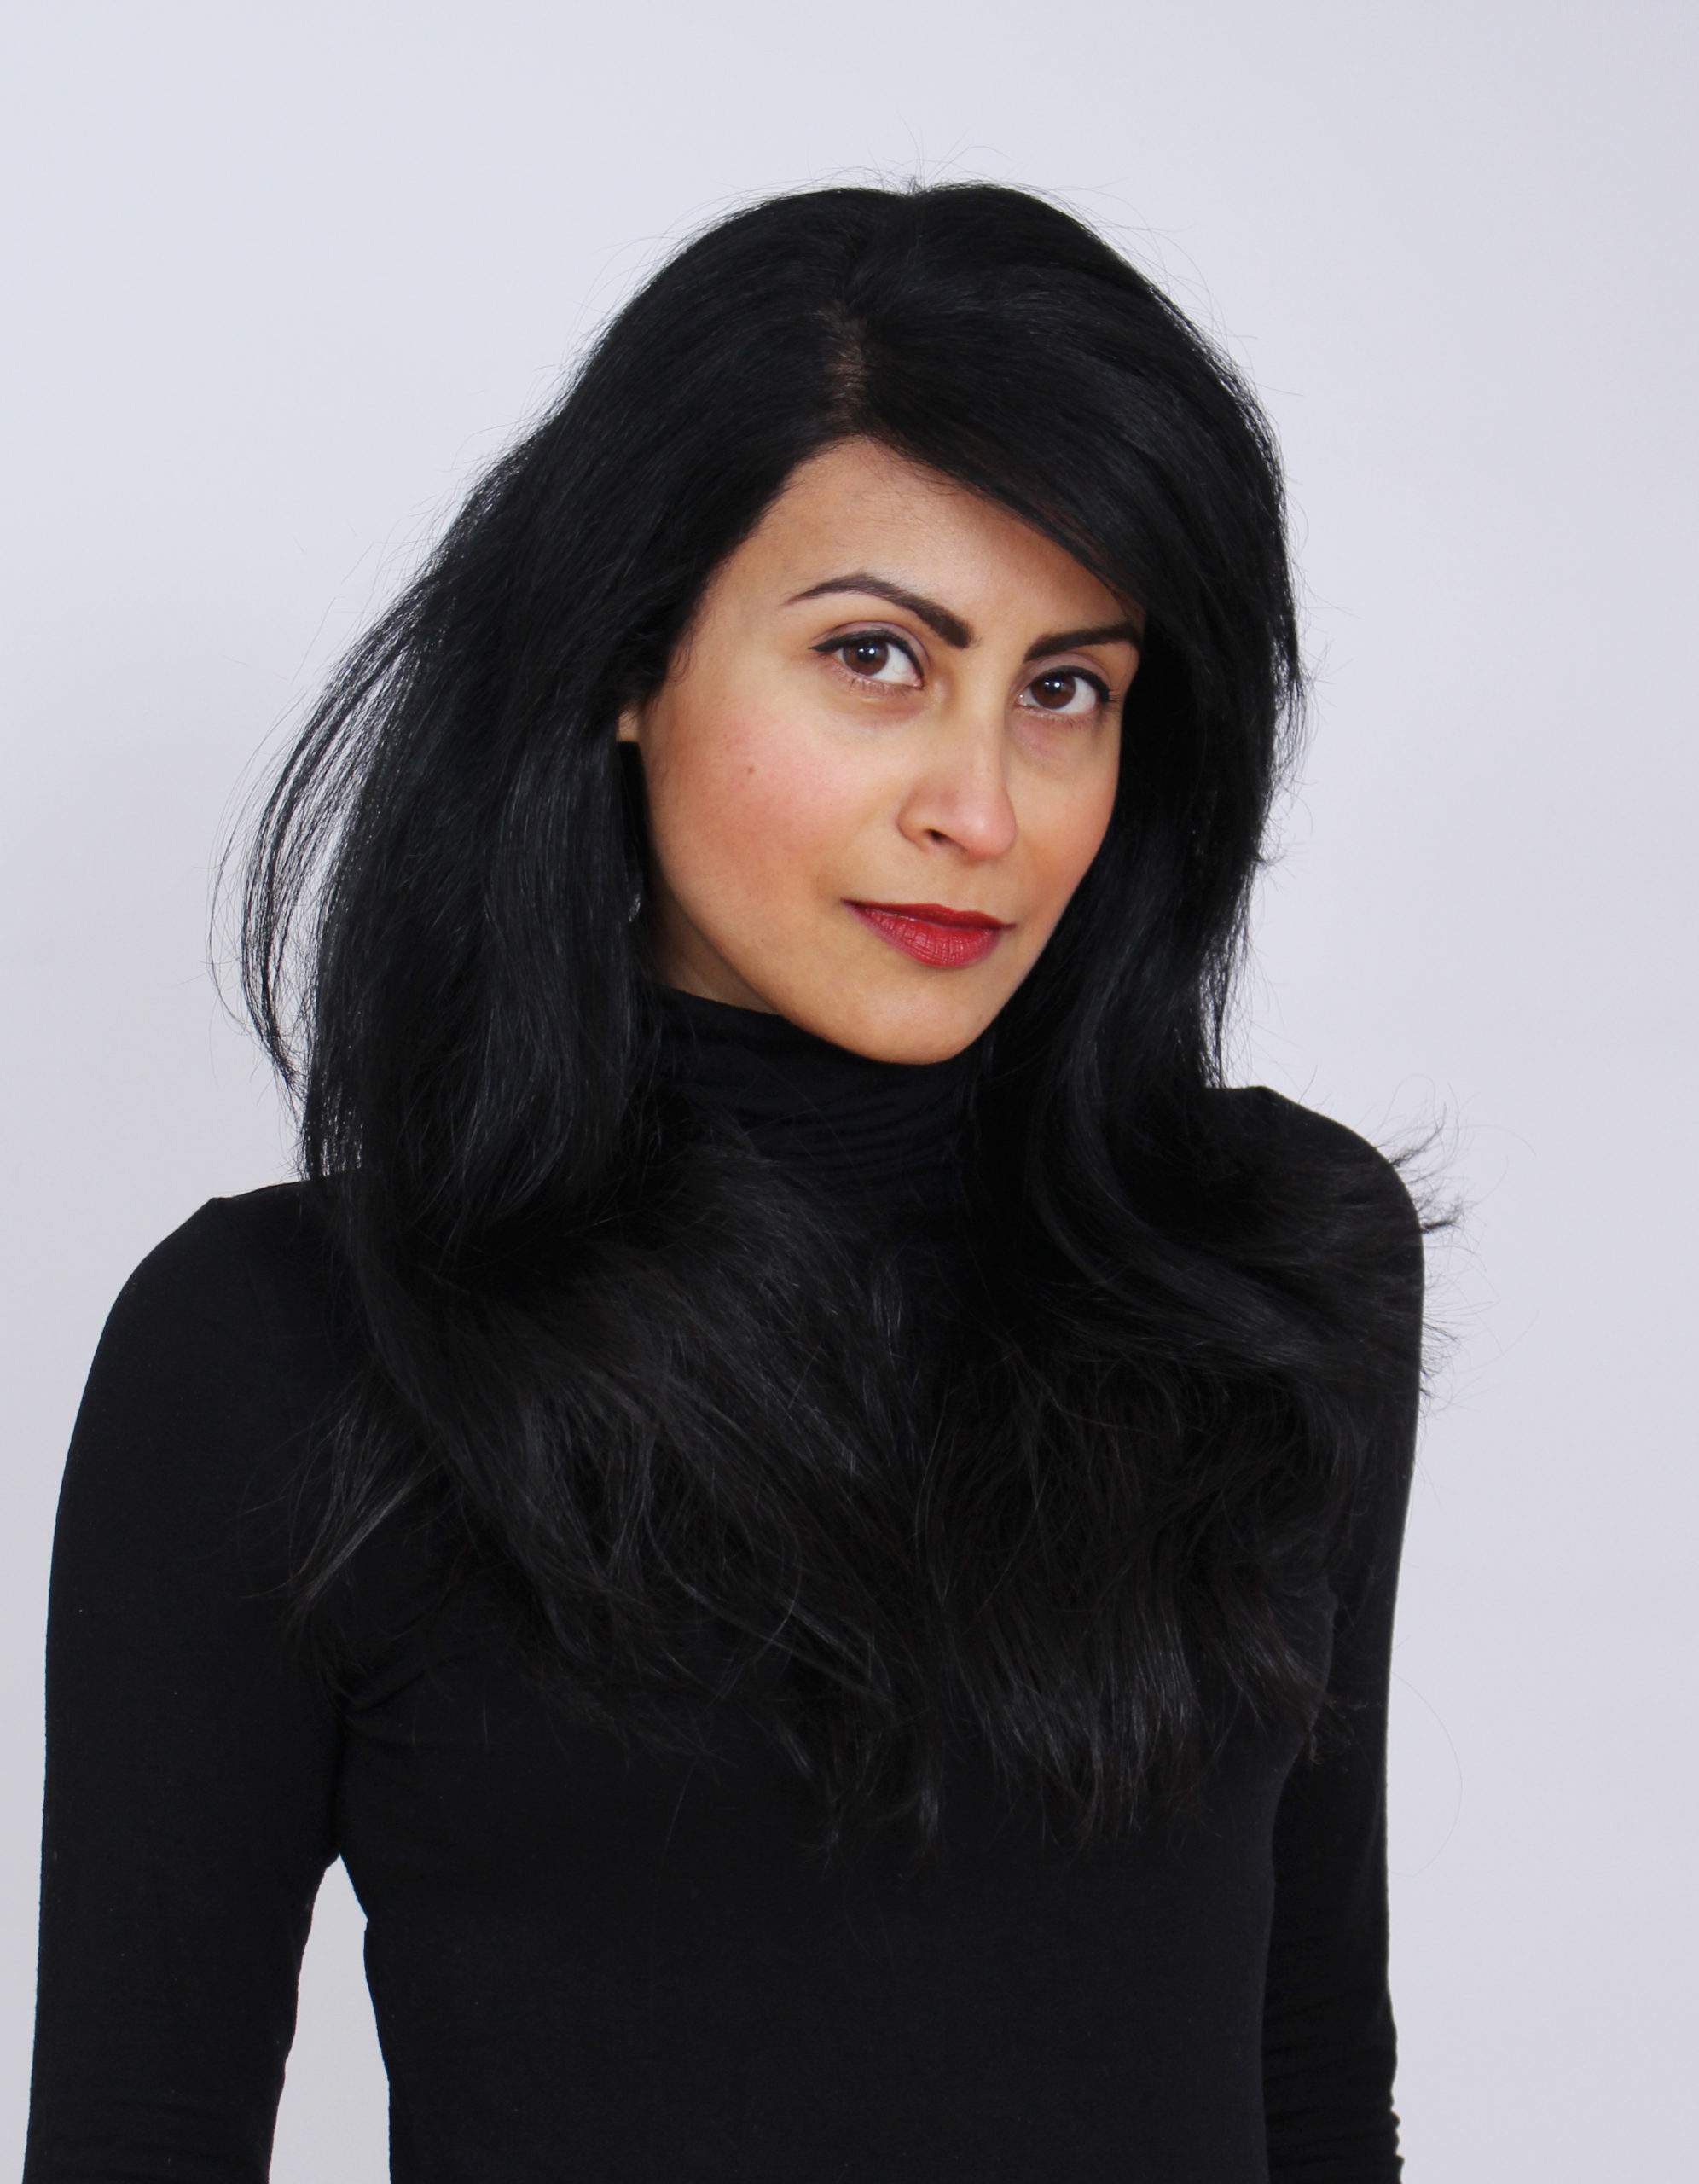 Alyena Rahman